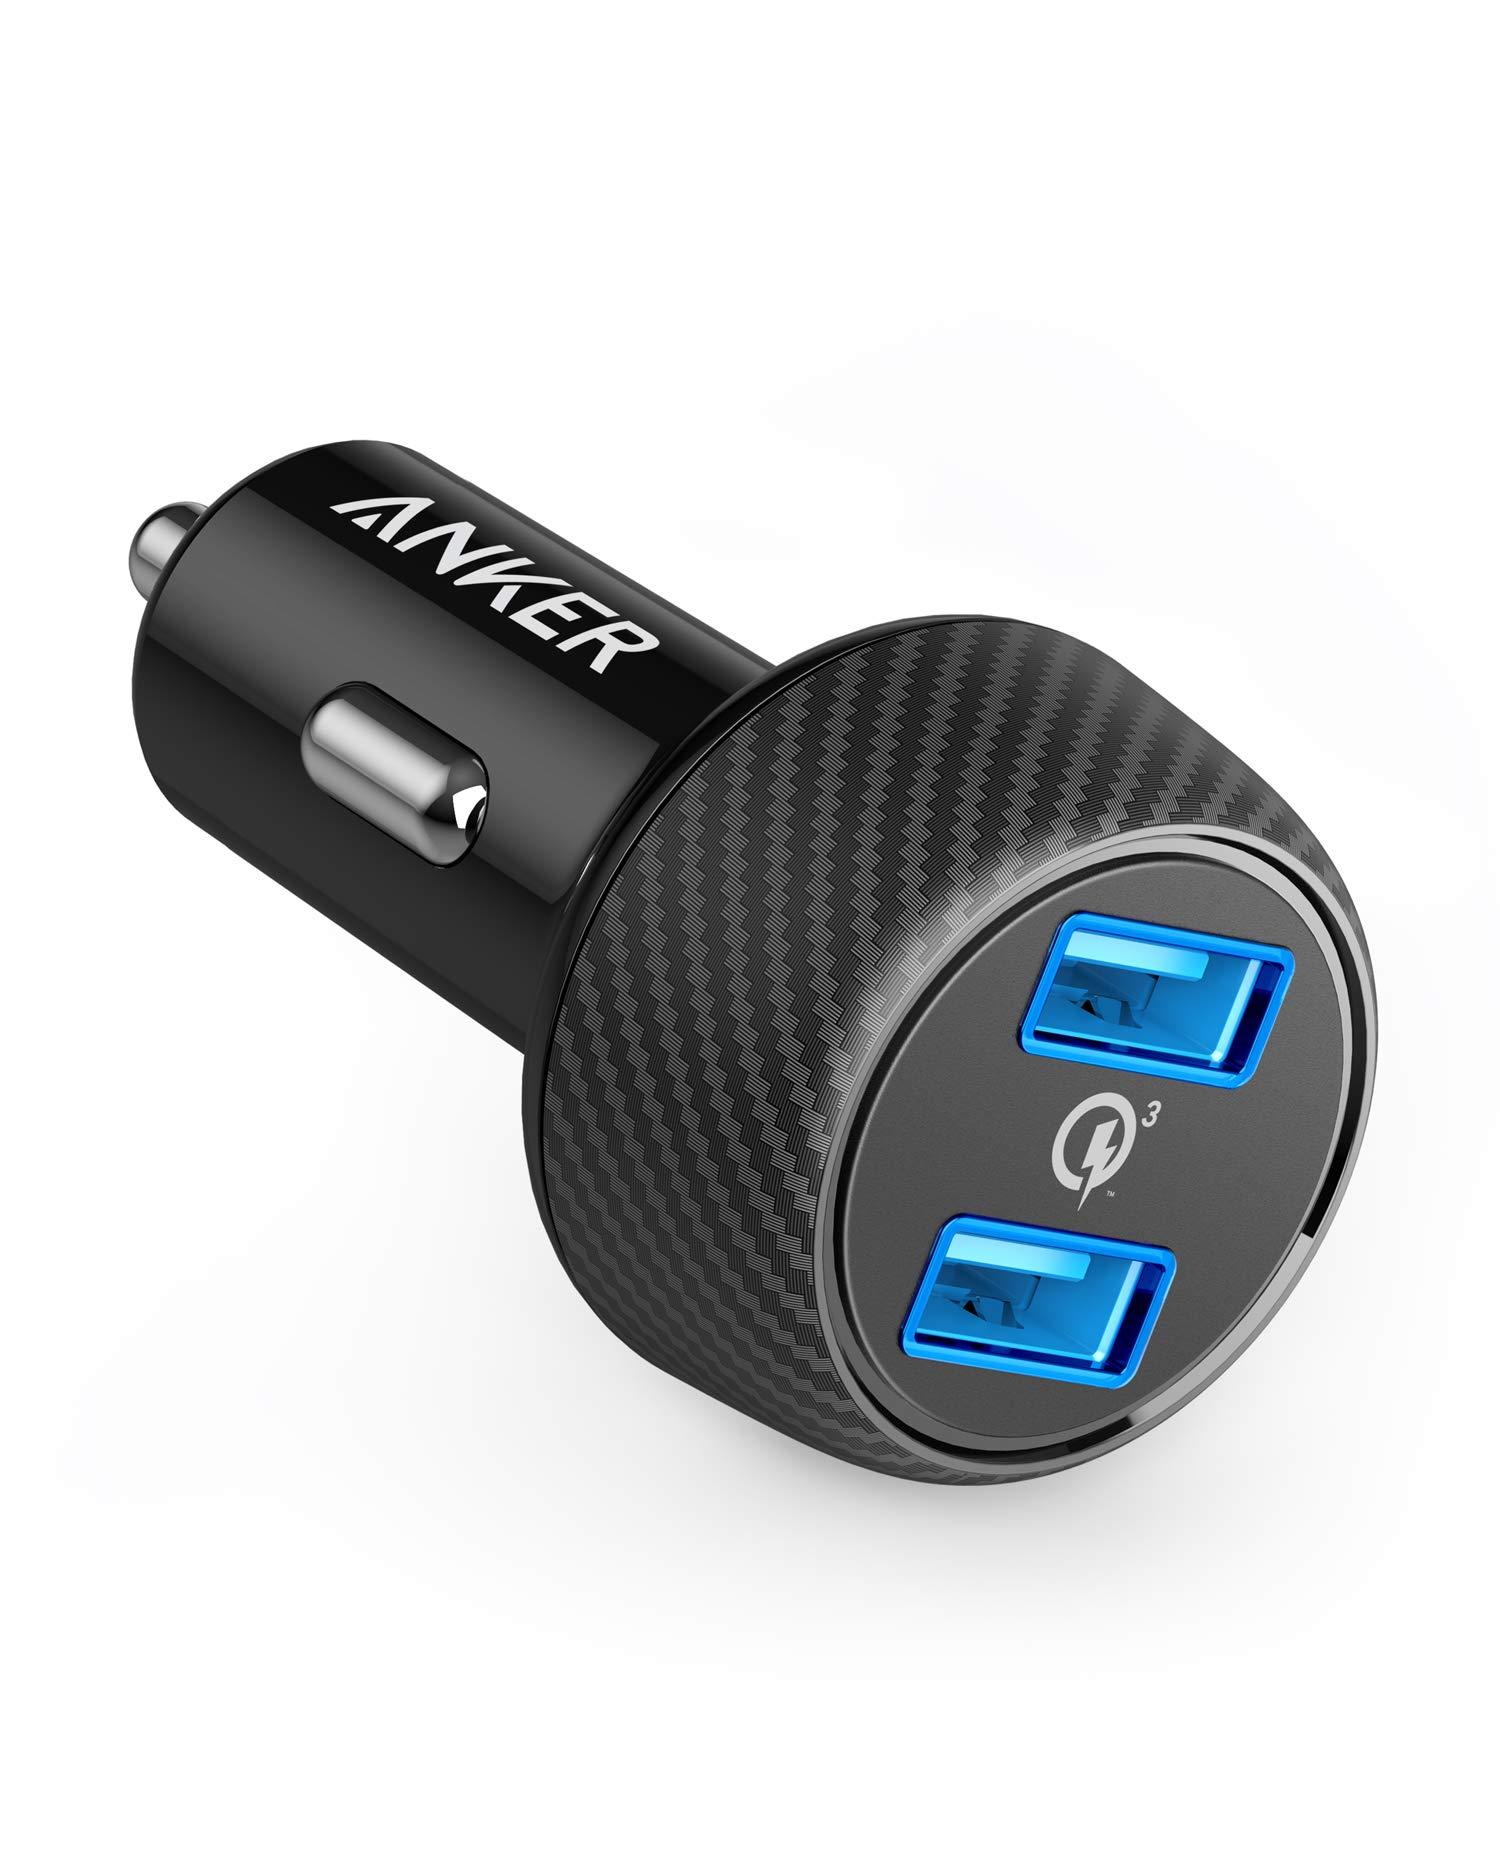 Anker-PowerDrive-Speed-2-39W-Auto-Ladegert-2-Port-Kfz-Ladegert-mit-Quick-Charge-30-und-PowerIQ-fr-Samsung-GalaxyNote-S9-iPhone-iPad-HTC-LG-Smartphones-Tablets-Powerbank-und-mehr